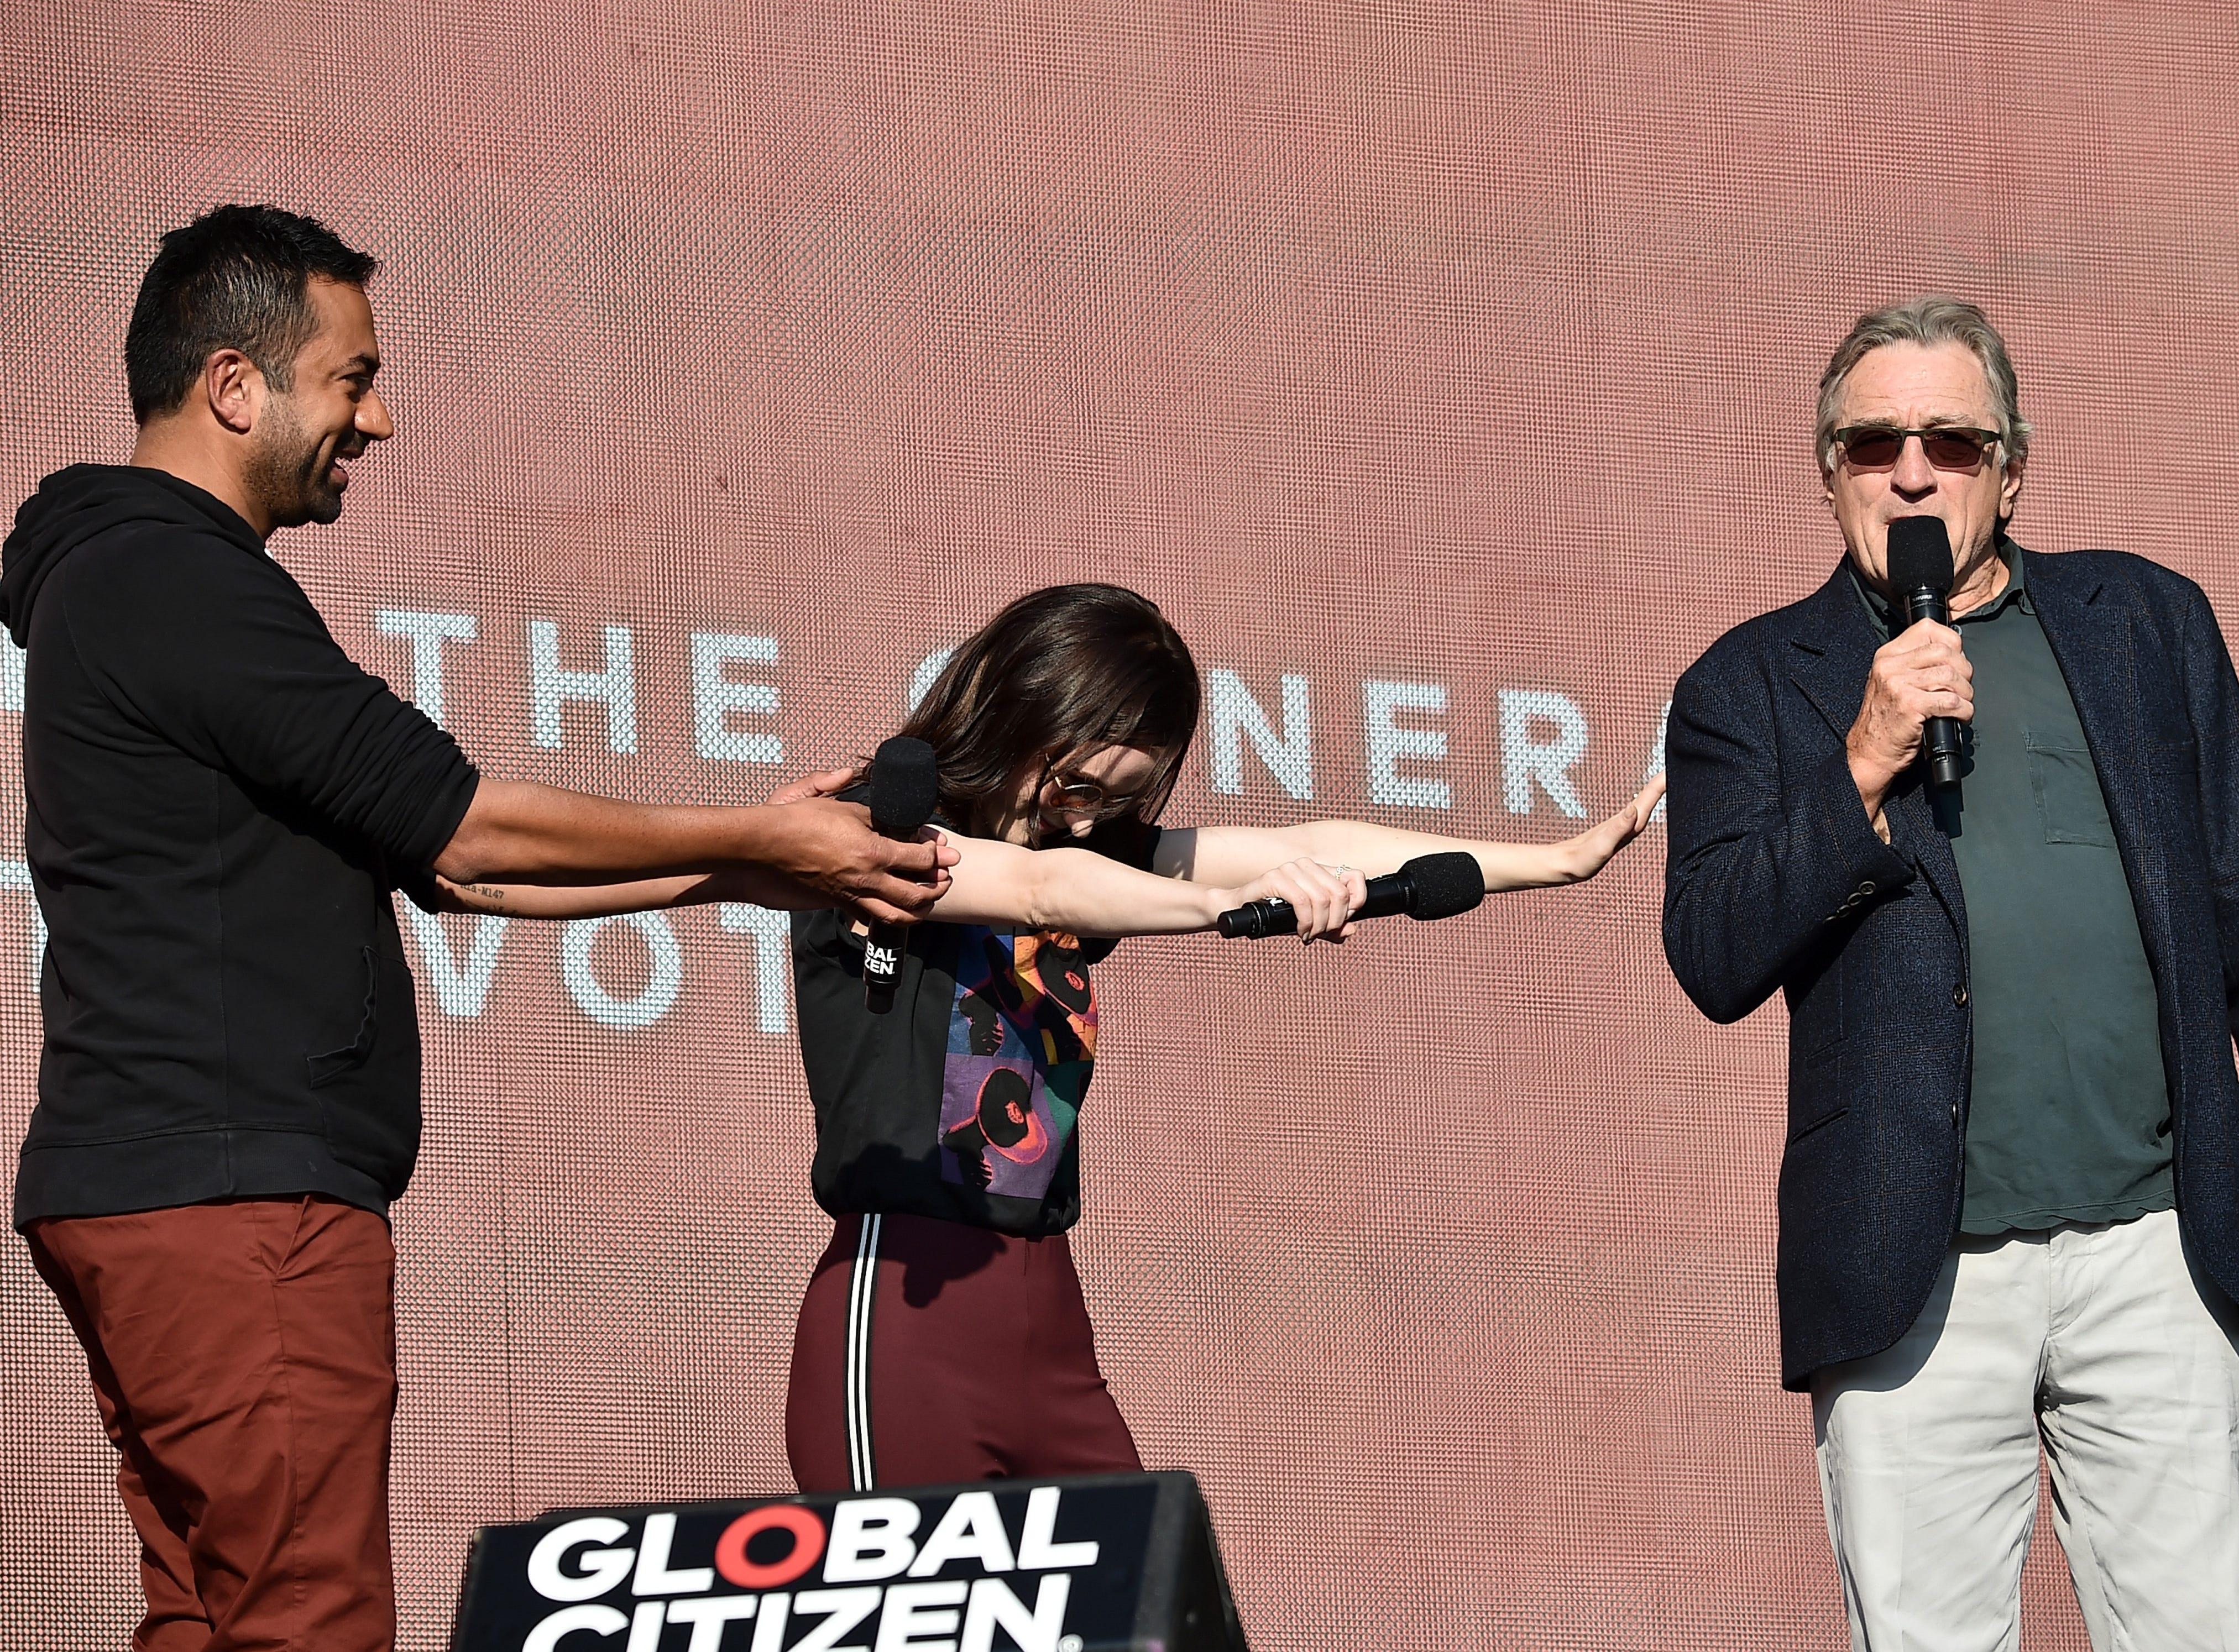 September 29: Kal Penn and Rachel Brosnahan bow down to Robert De Niro onstage during the 2018 Global Citizen Festival in New York City.